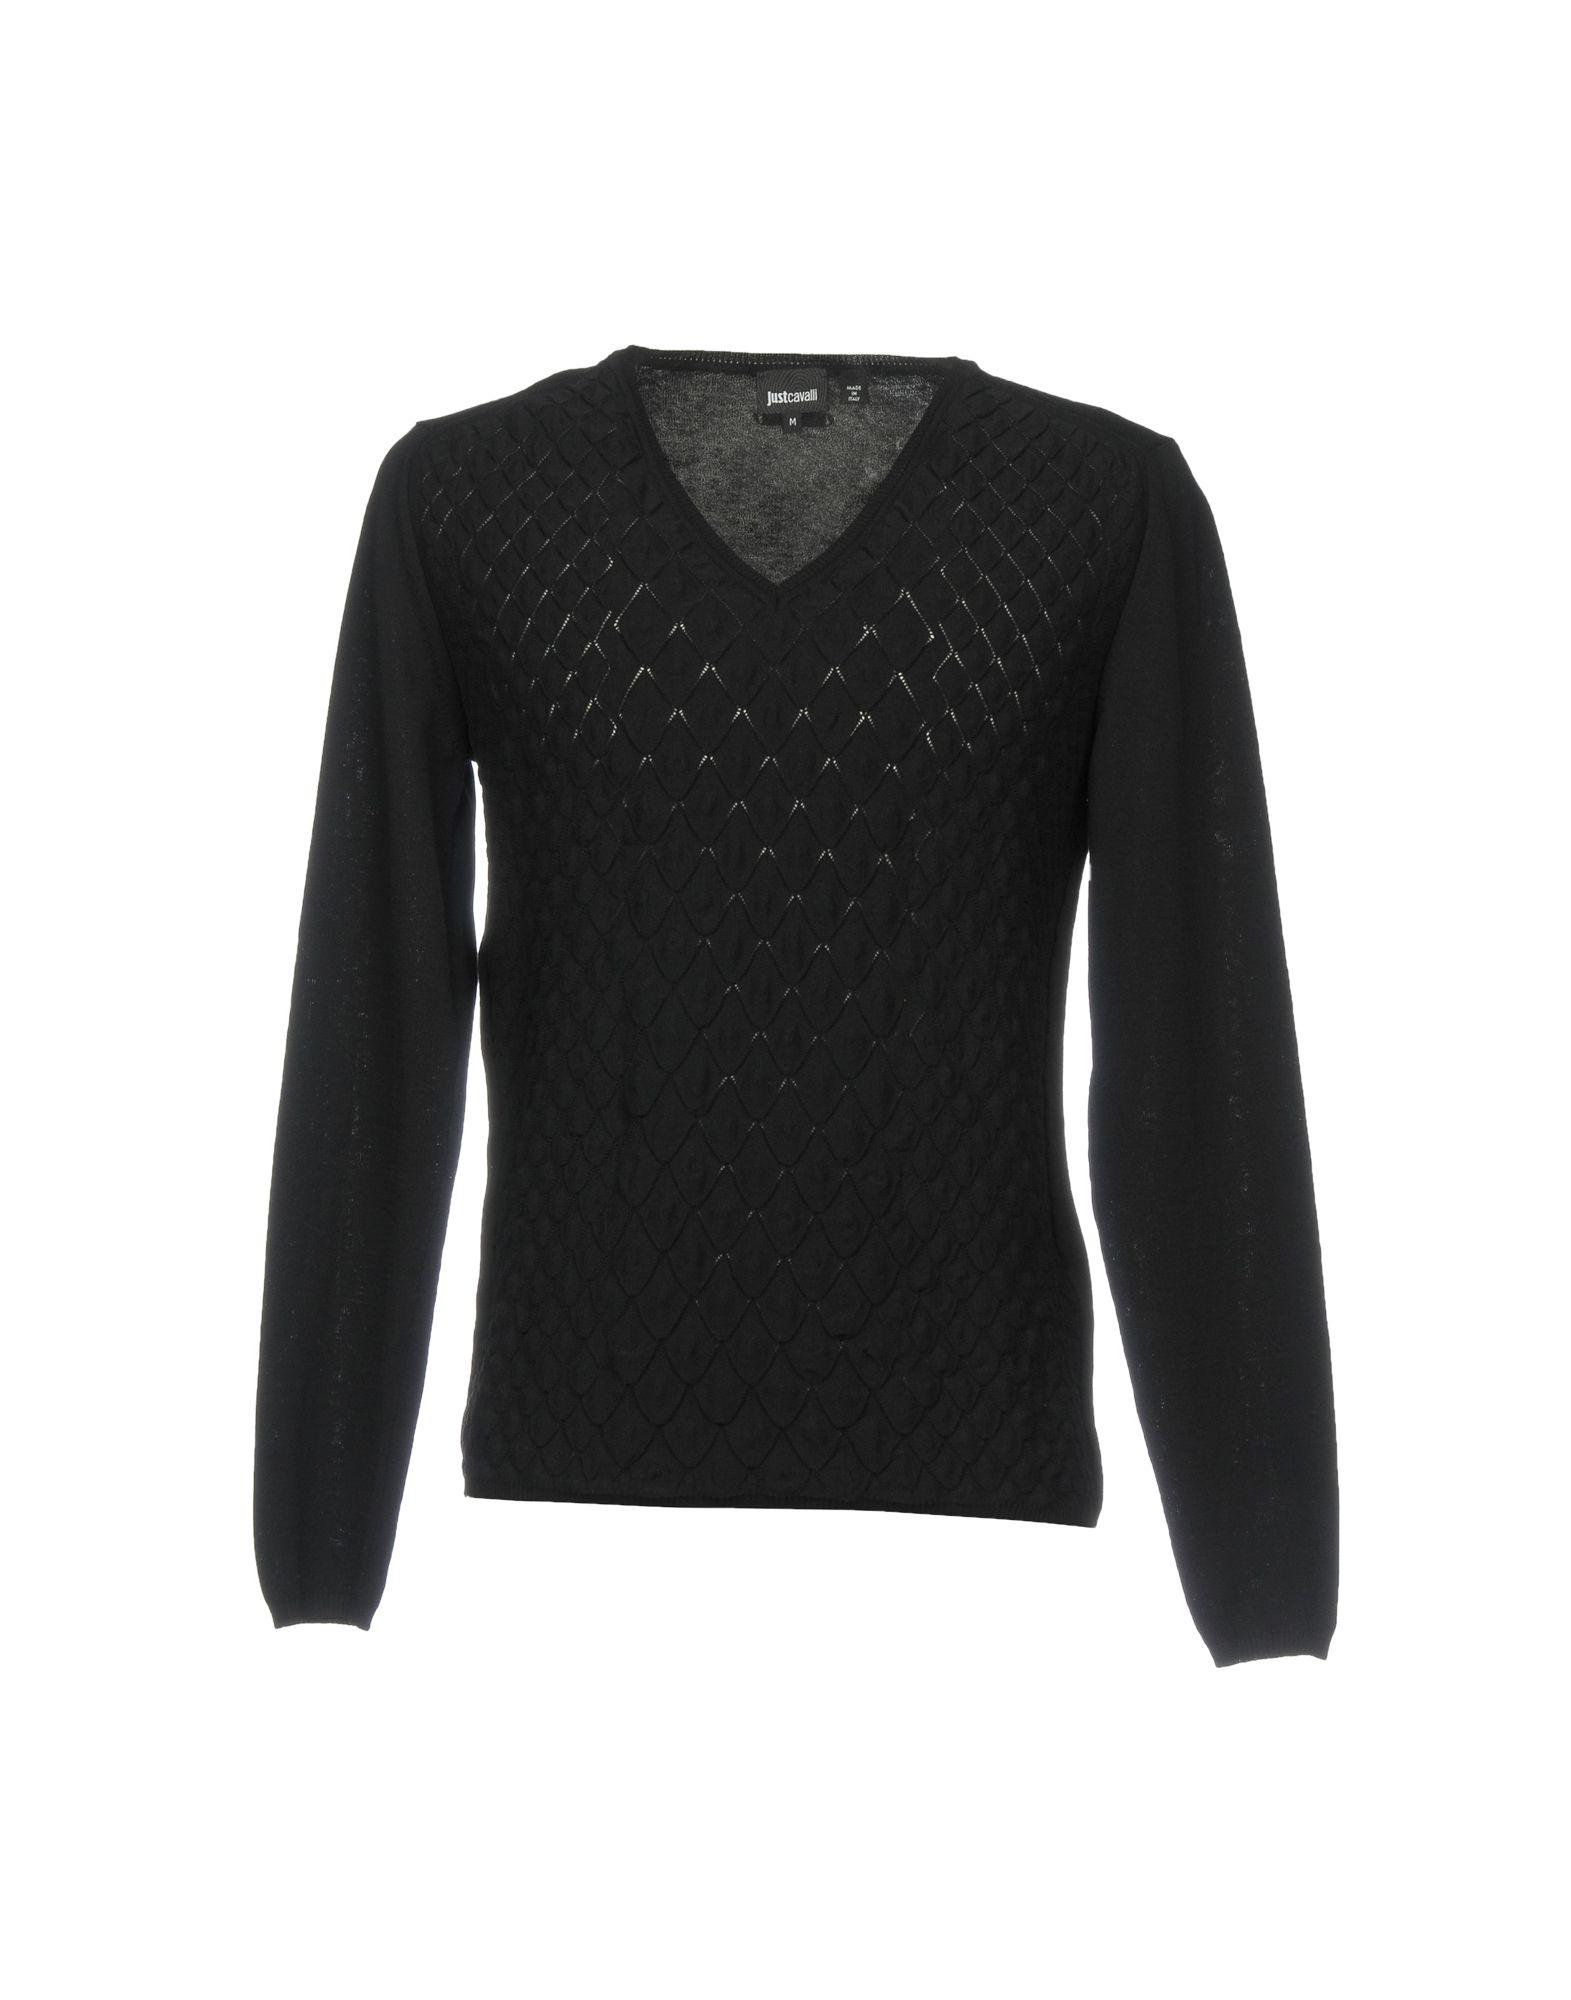 Pullover Pullover Pullover Just Cavalli Uomo - 39838289PI 305004